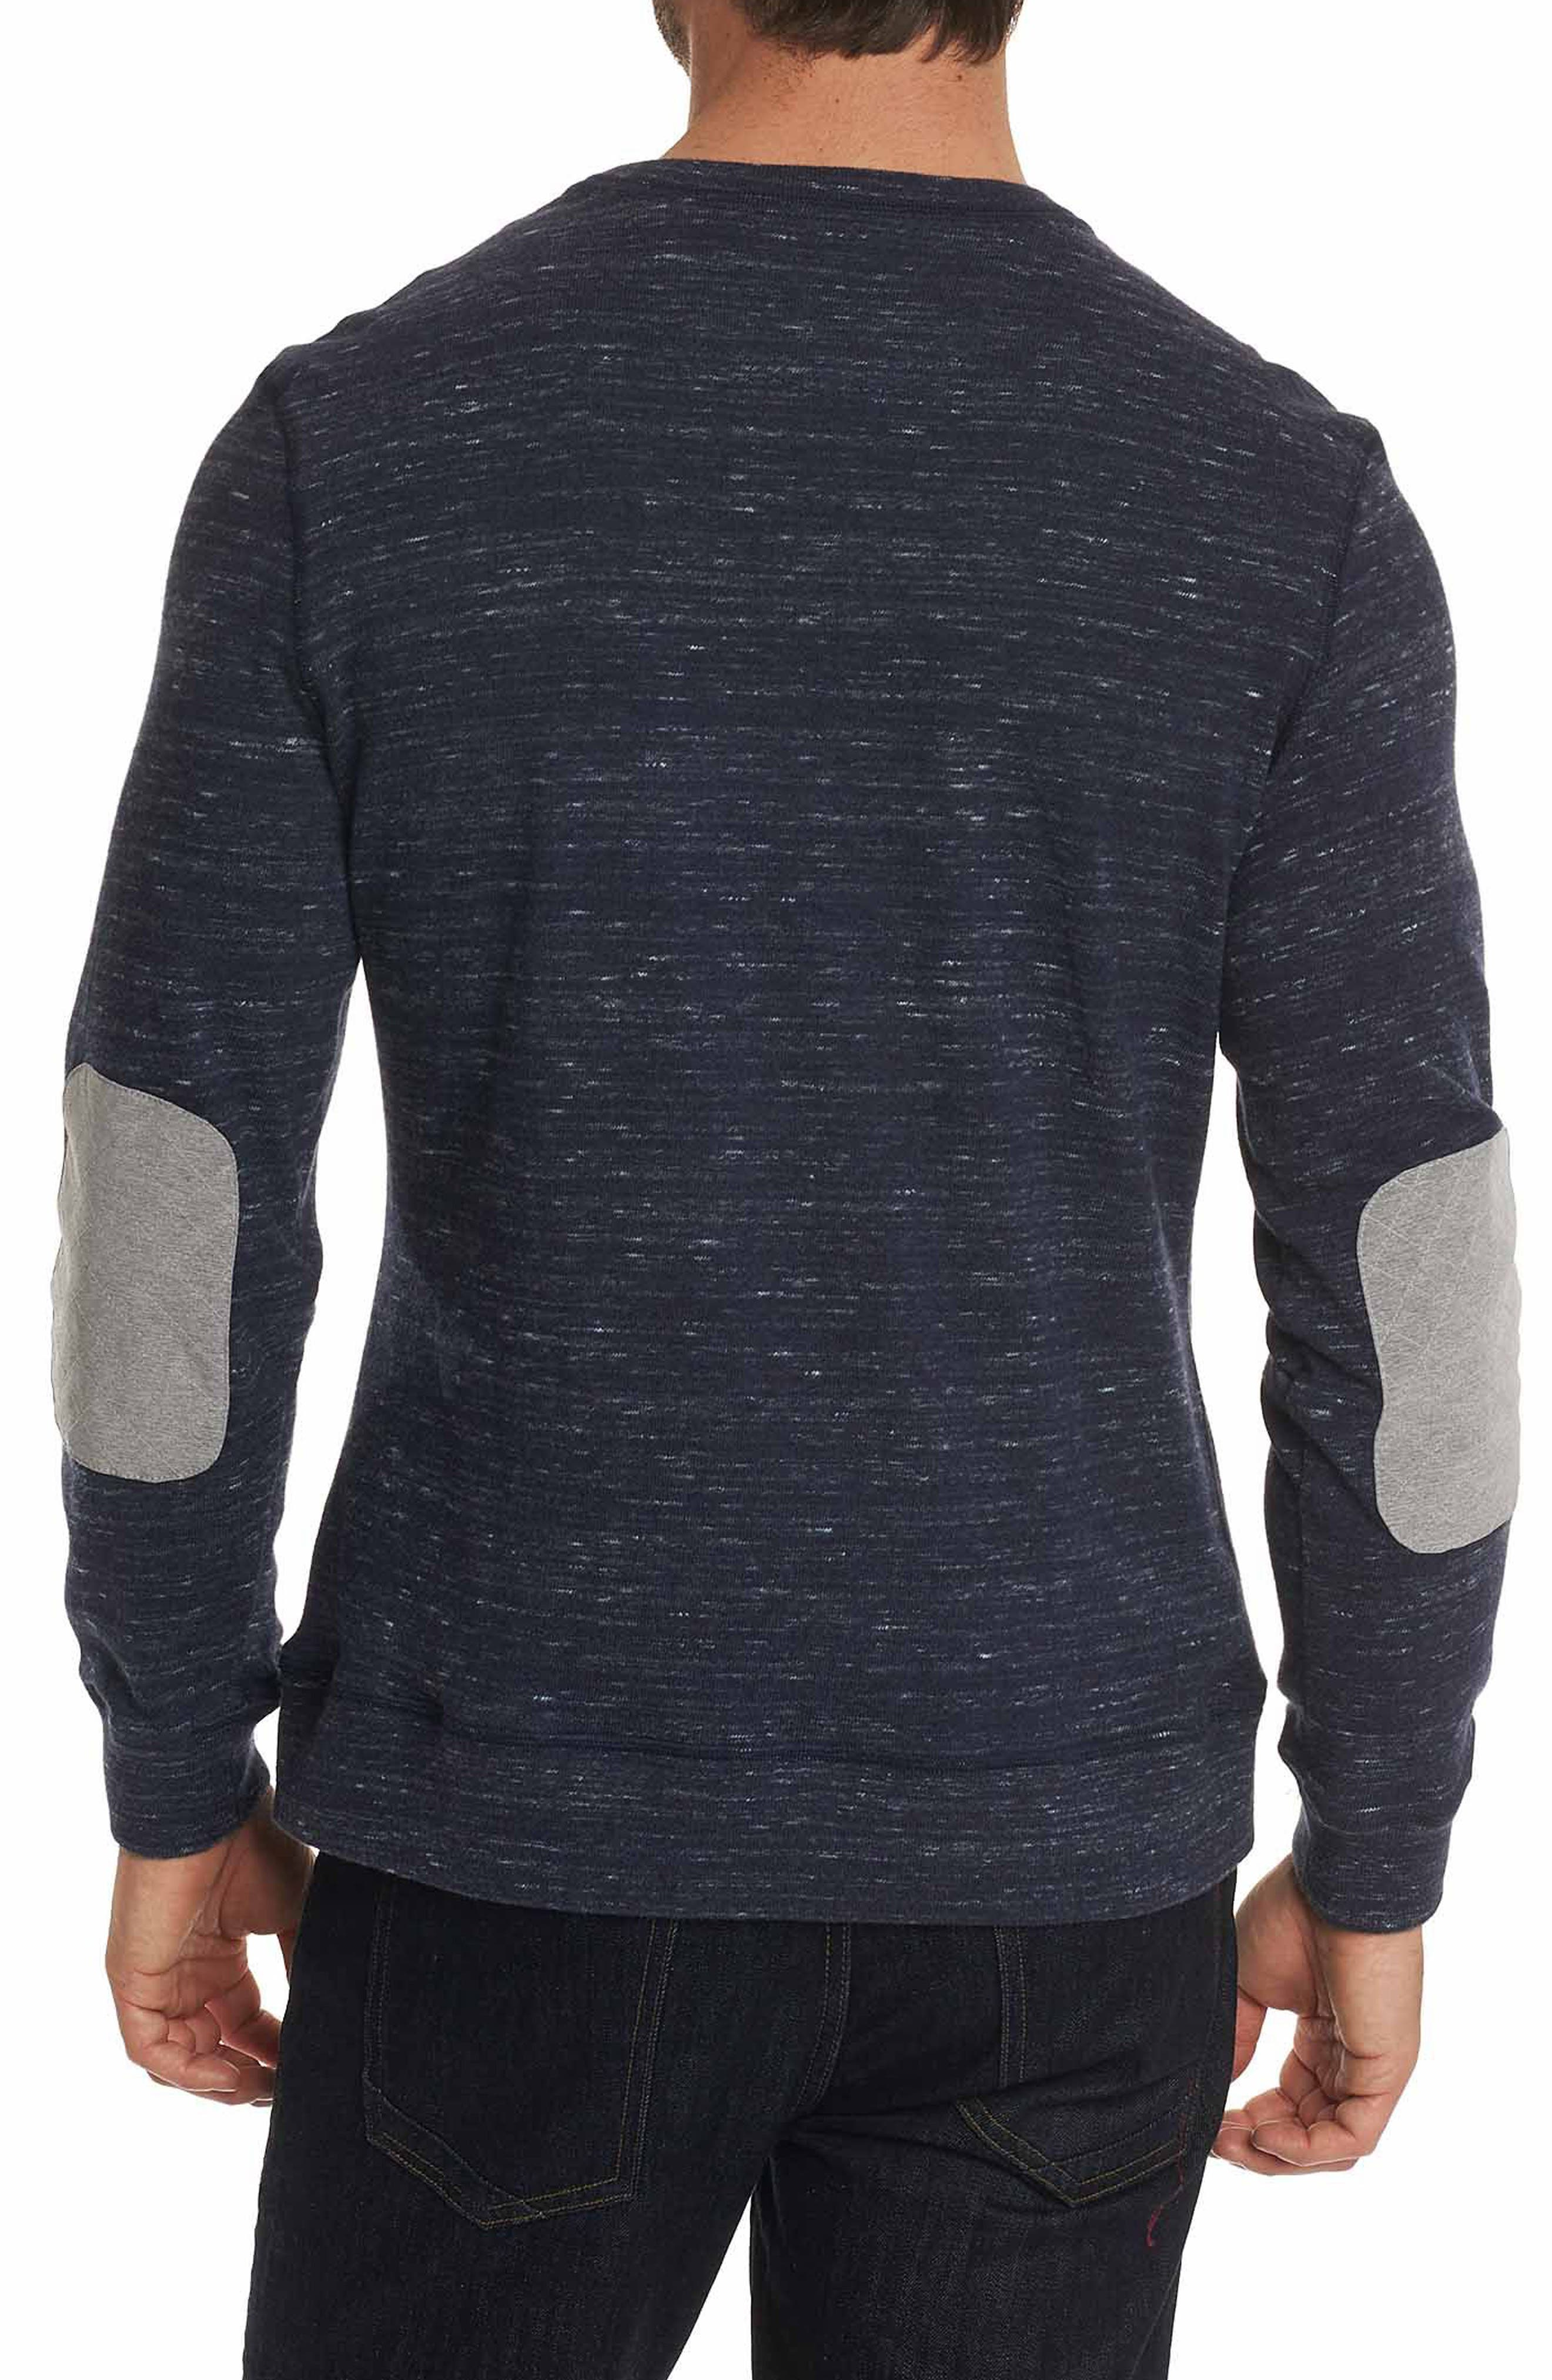 Endurance Elbow Patch Sweatshirt,                             Alternate thumbnail 2, color,                             Heather Navy